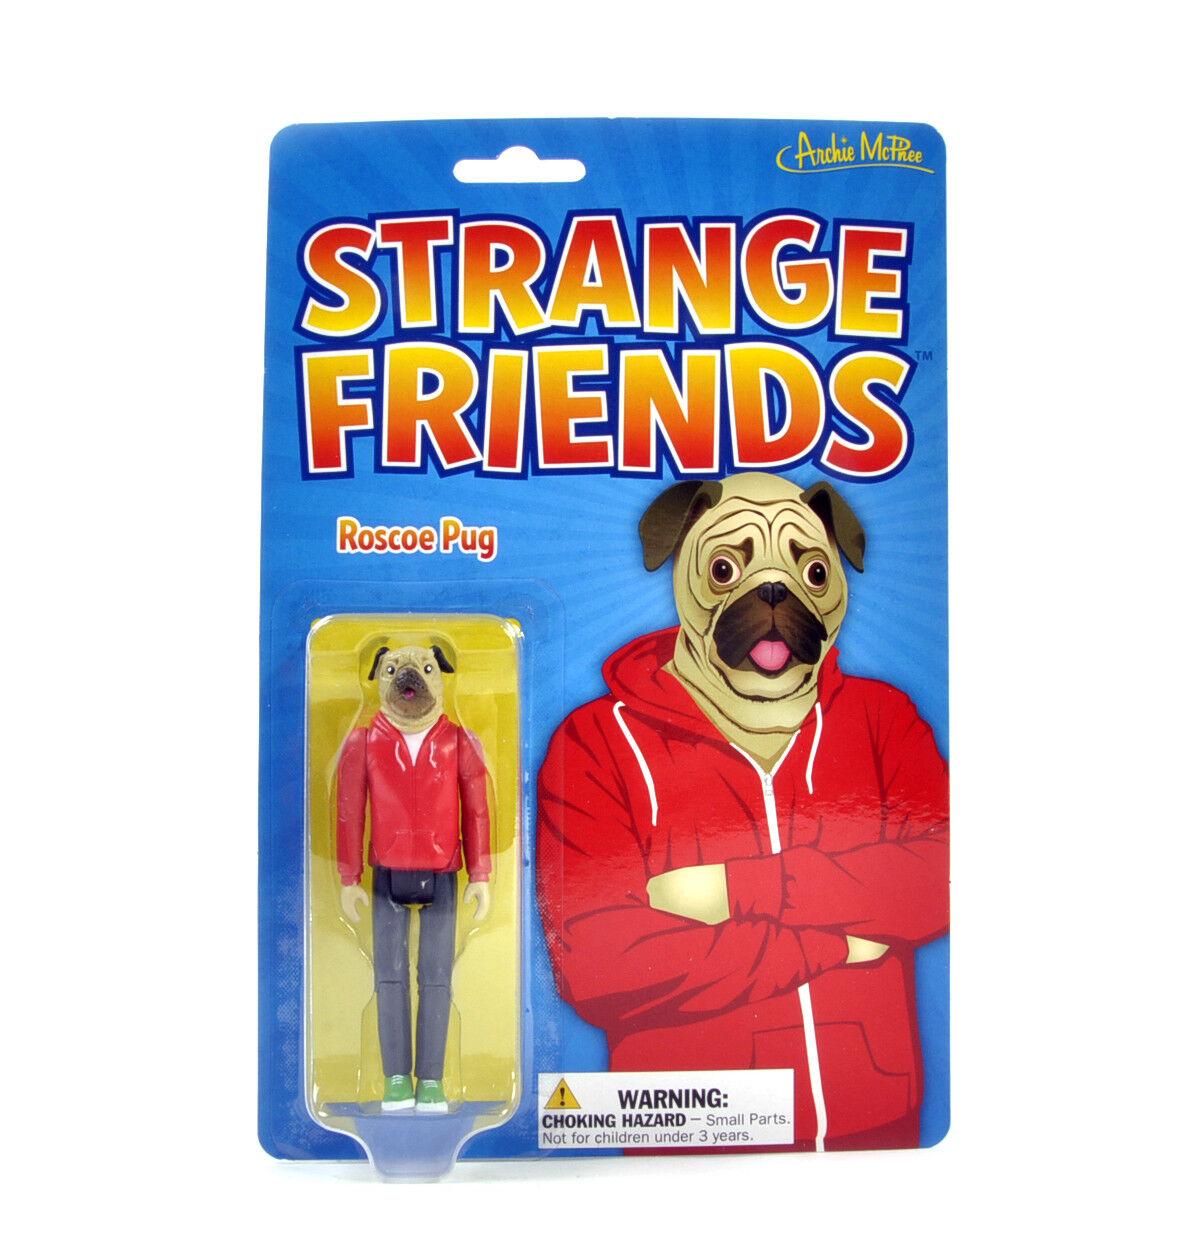 Strange Friends - Roscoe Pug Action Figure